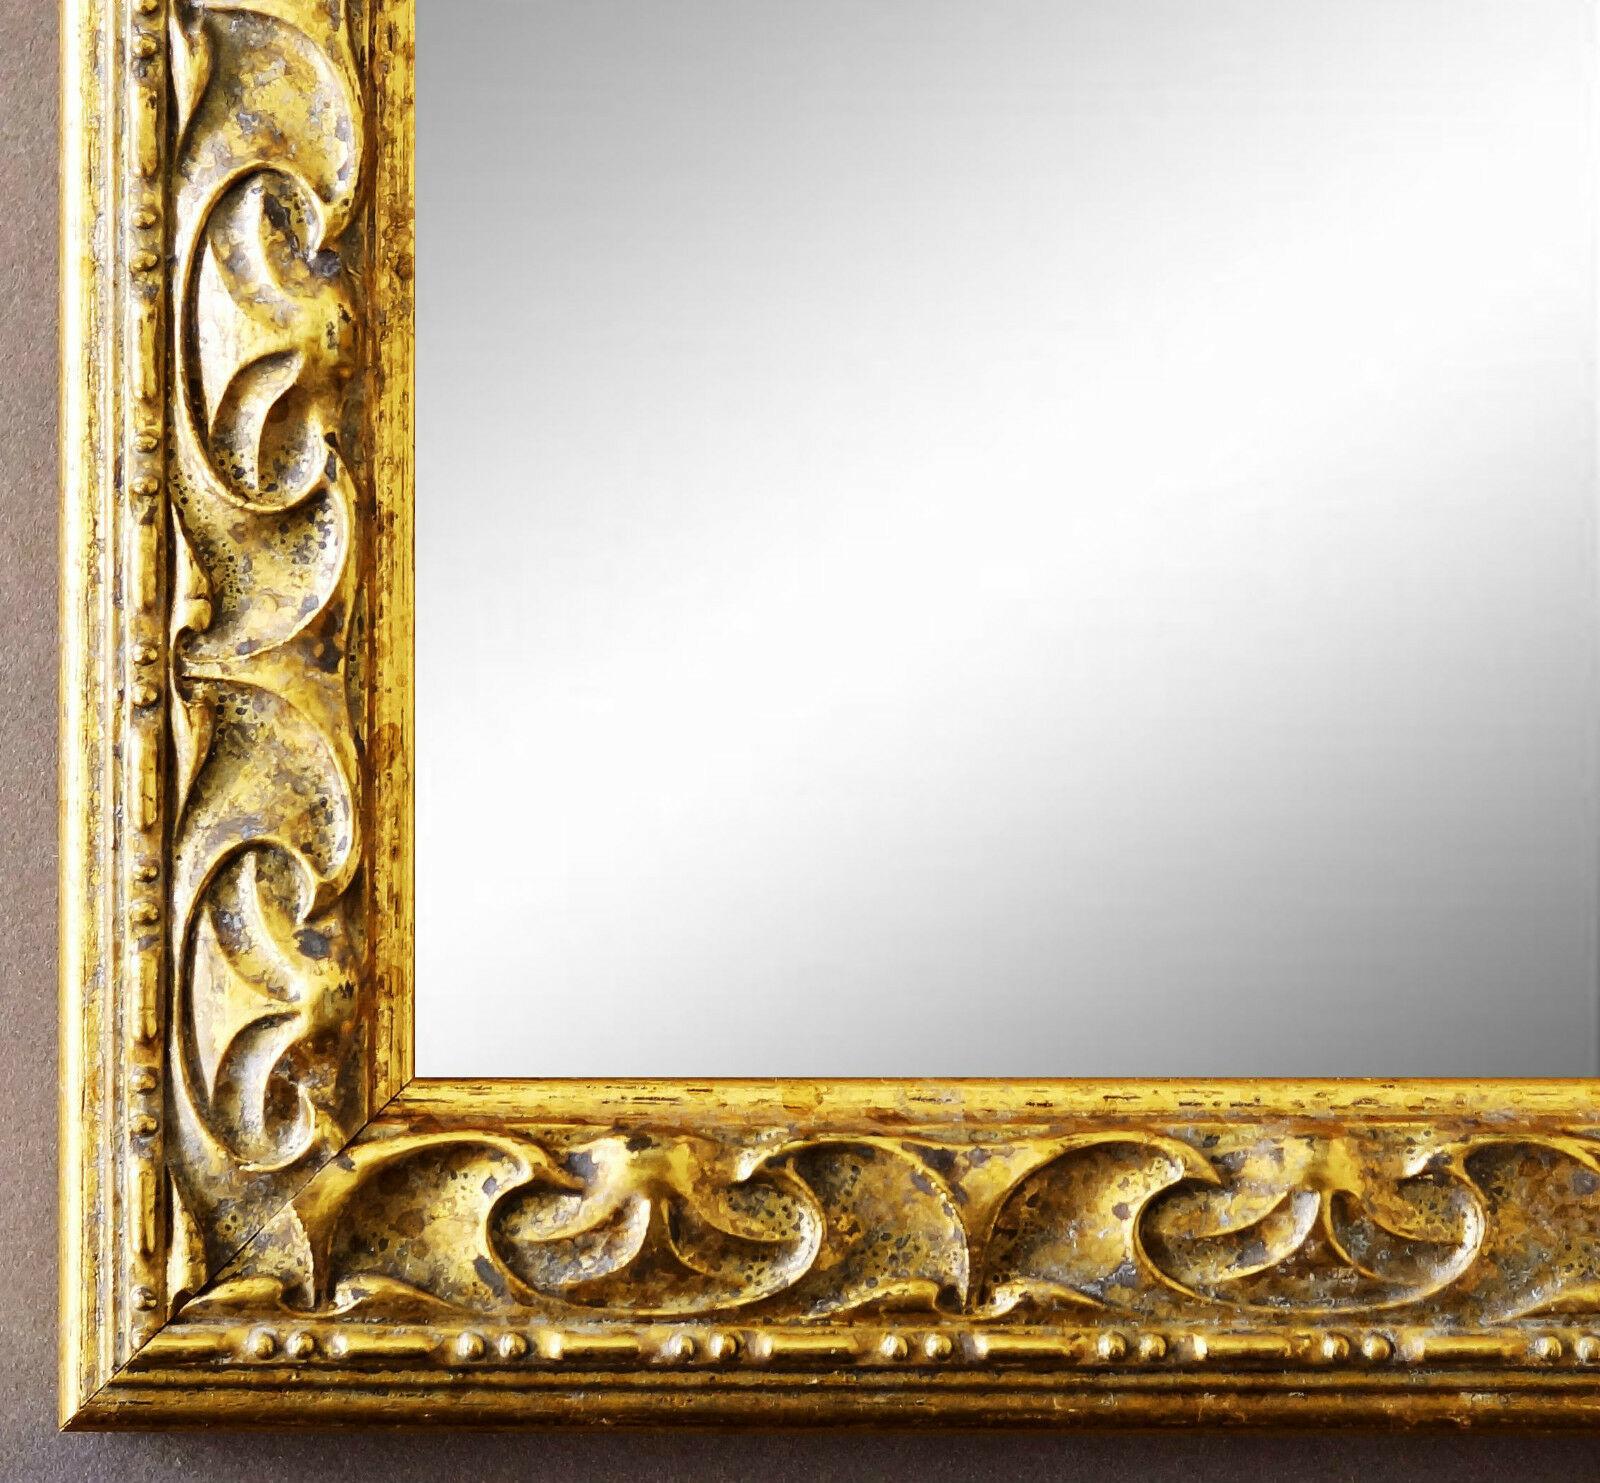 Barock wandspiegel cheap spiegel nach ma barock spiegel - Schwarzer barock spiegel ...